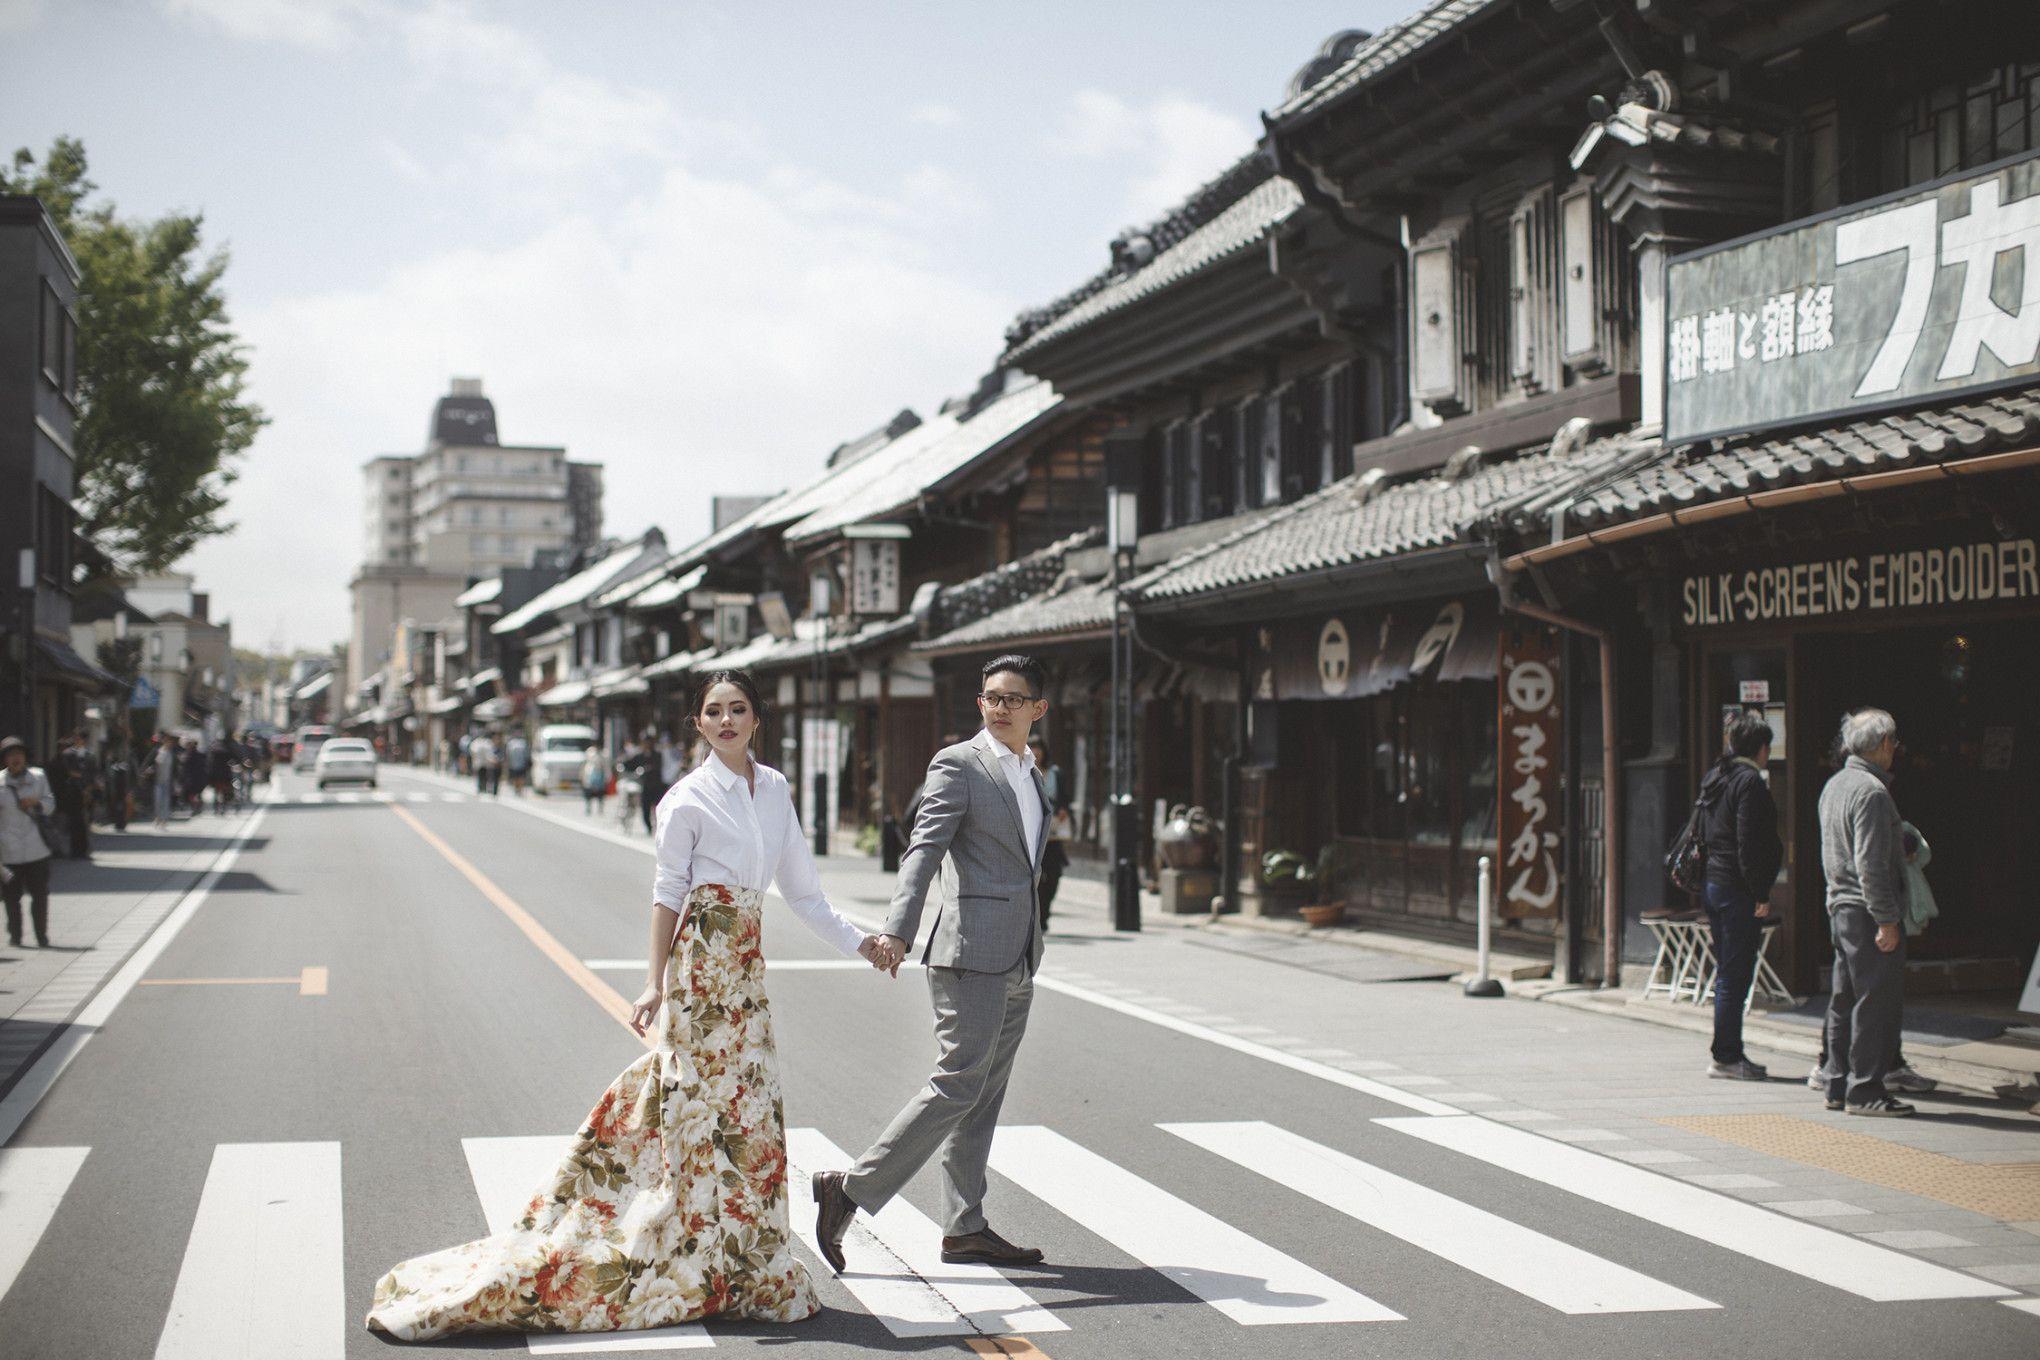 Olivia Lazuardy And Kalvin S Pre Wedding Shoot In Japan 002 Foto Perkawinan Fotografi Perkawinan Fotografi - Perkawinan Zebra, Chimera Dan 18 Hewan Kawin Silang Beda Spesies Yang Berhasil Halaman 2